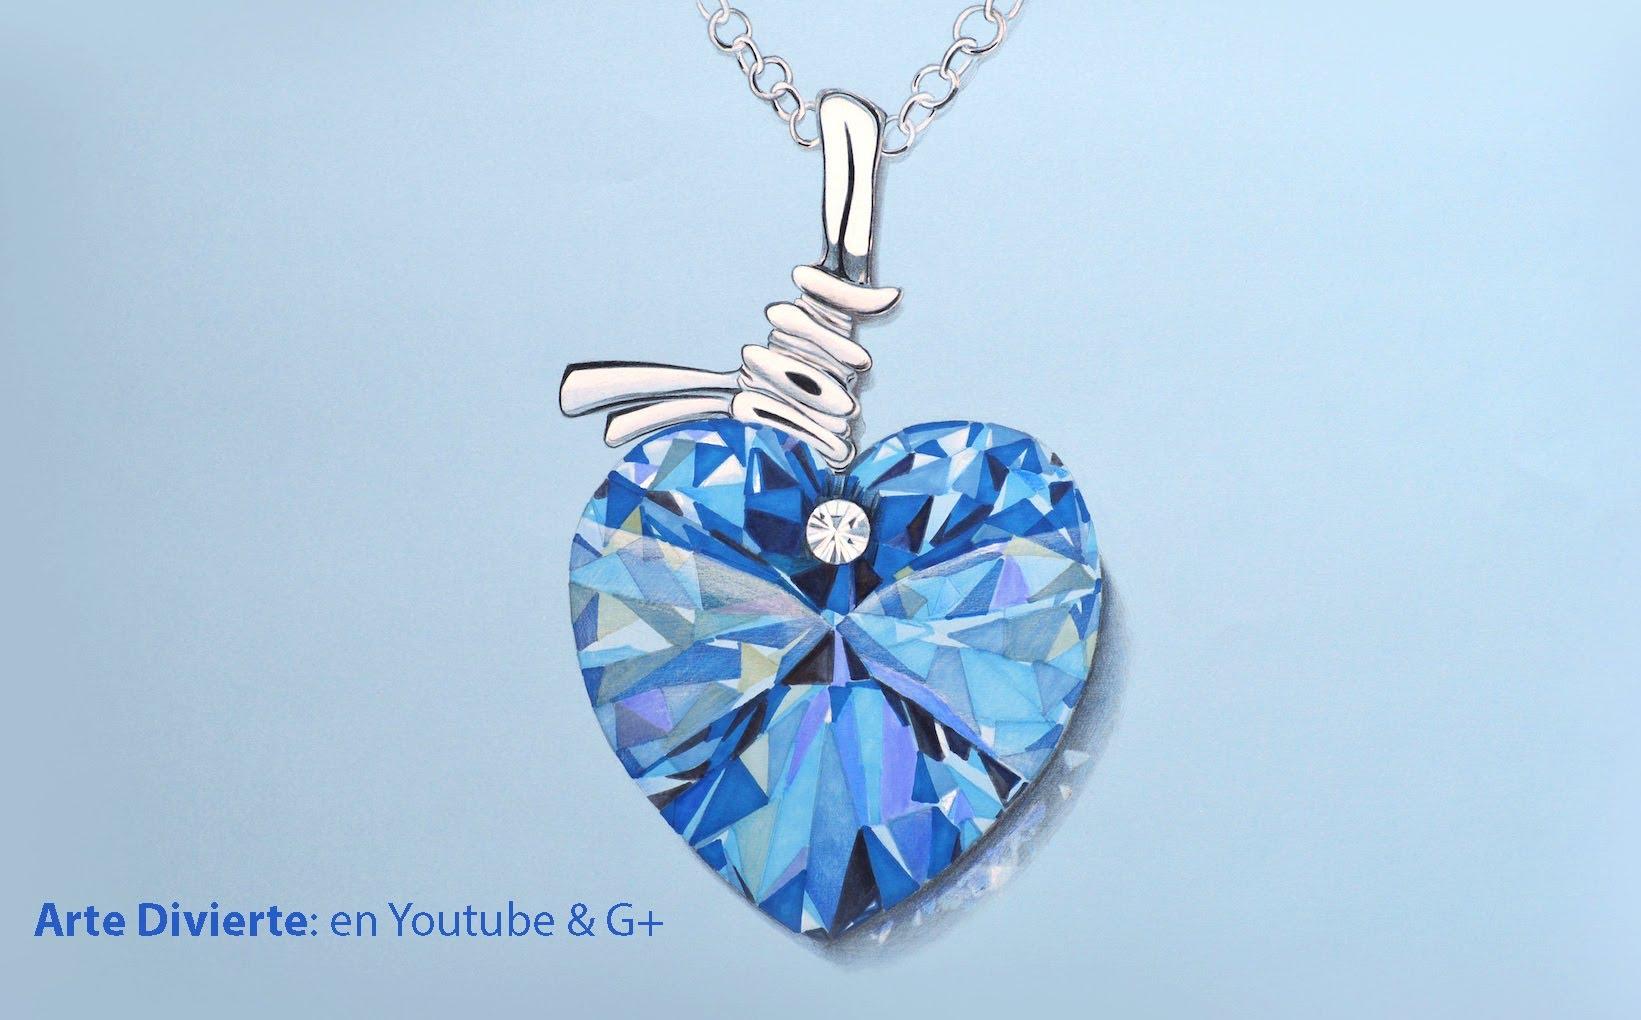 a2a172708084 Dibujando cristal  Cómo dibujar un corazón de Swarovski -Arte Divierte. -  YouTube